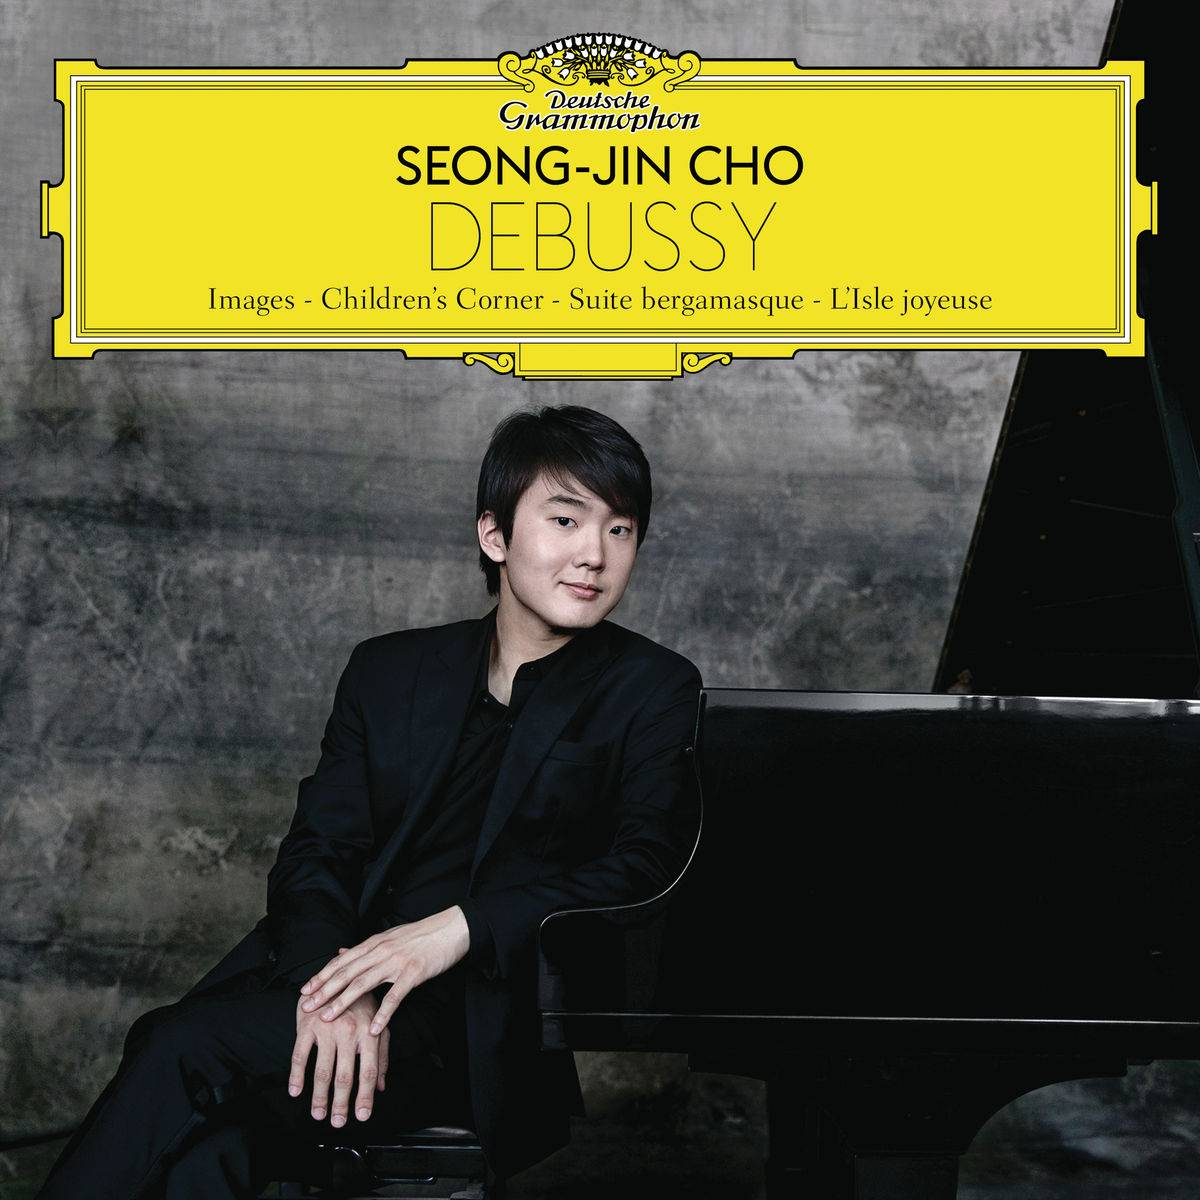 Seong-Jin Cho - Debussy (2017) [Official Digital Download 24/96]